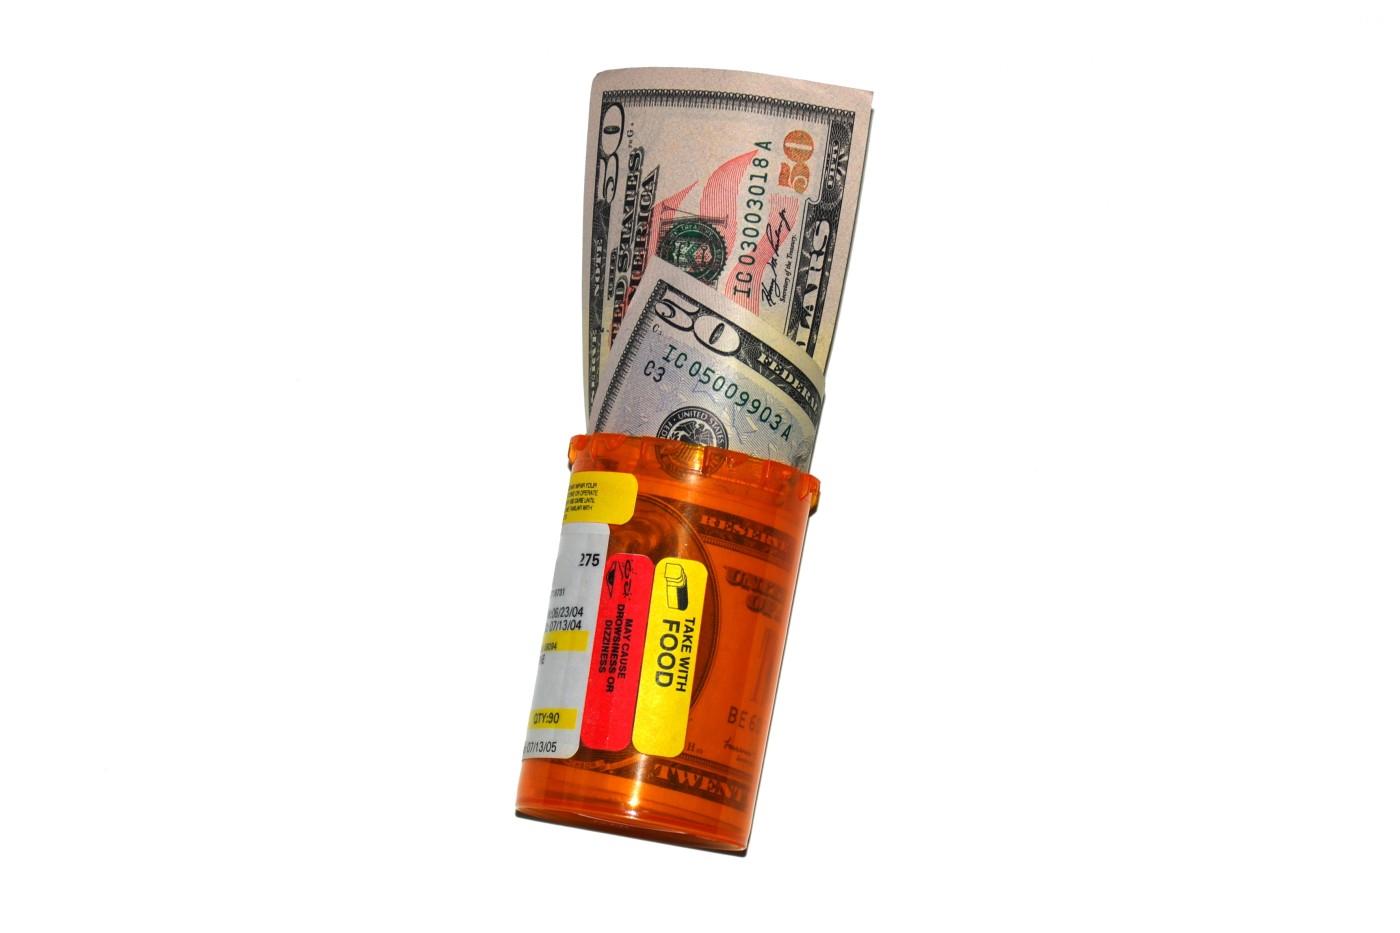 Image of prescription bottle with money in it.